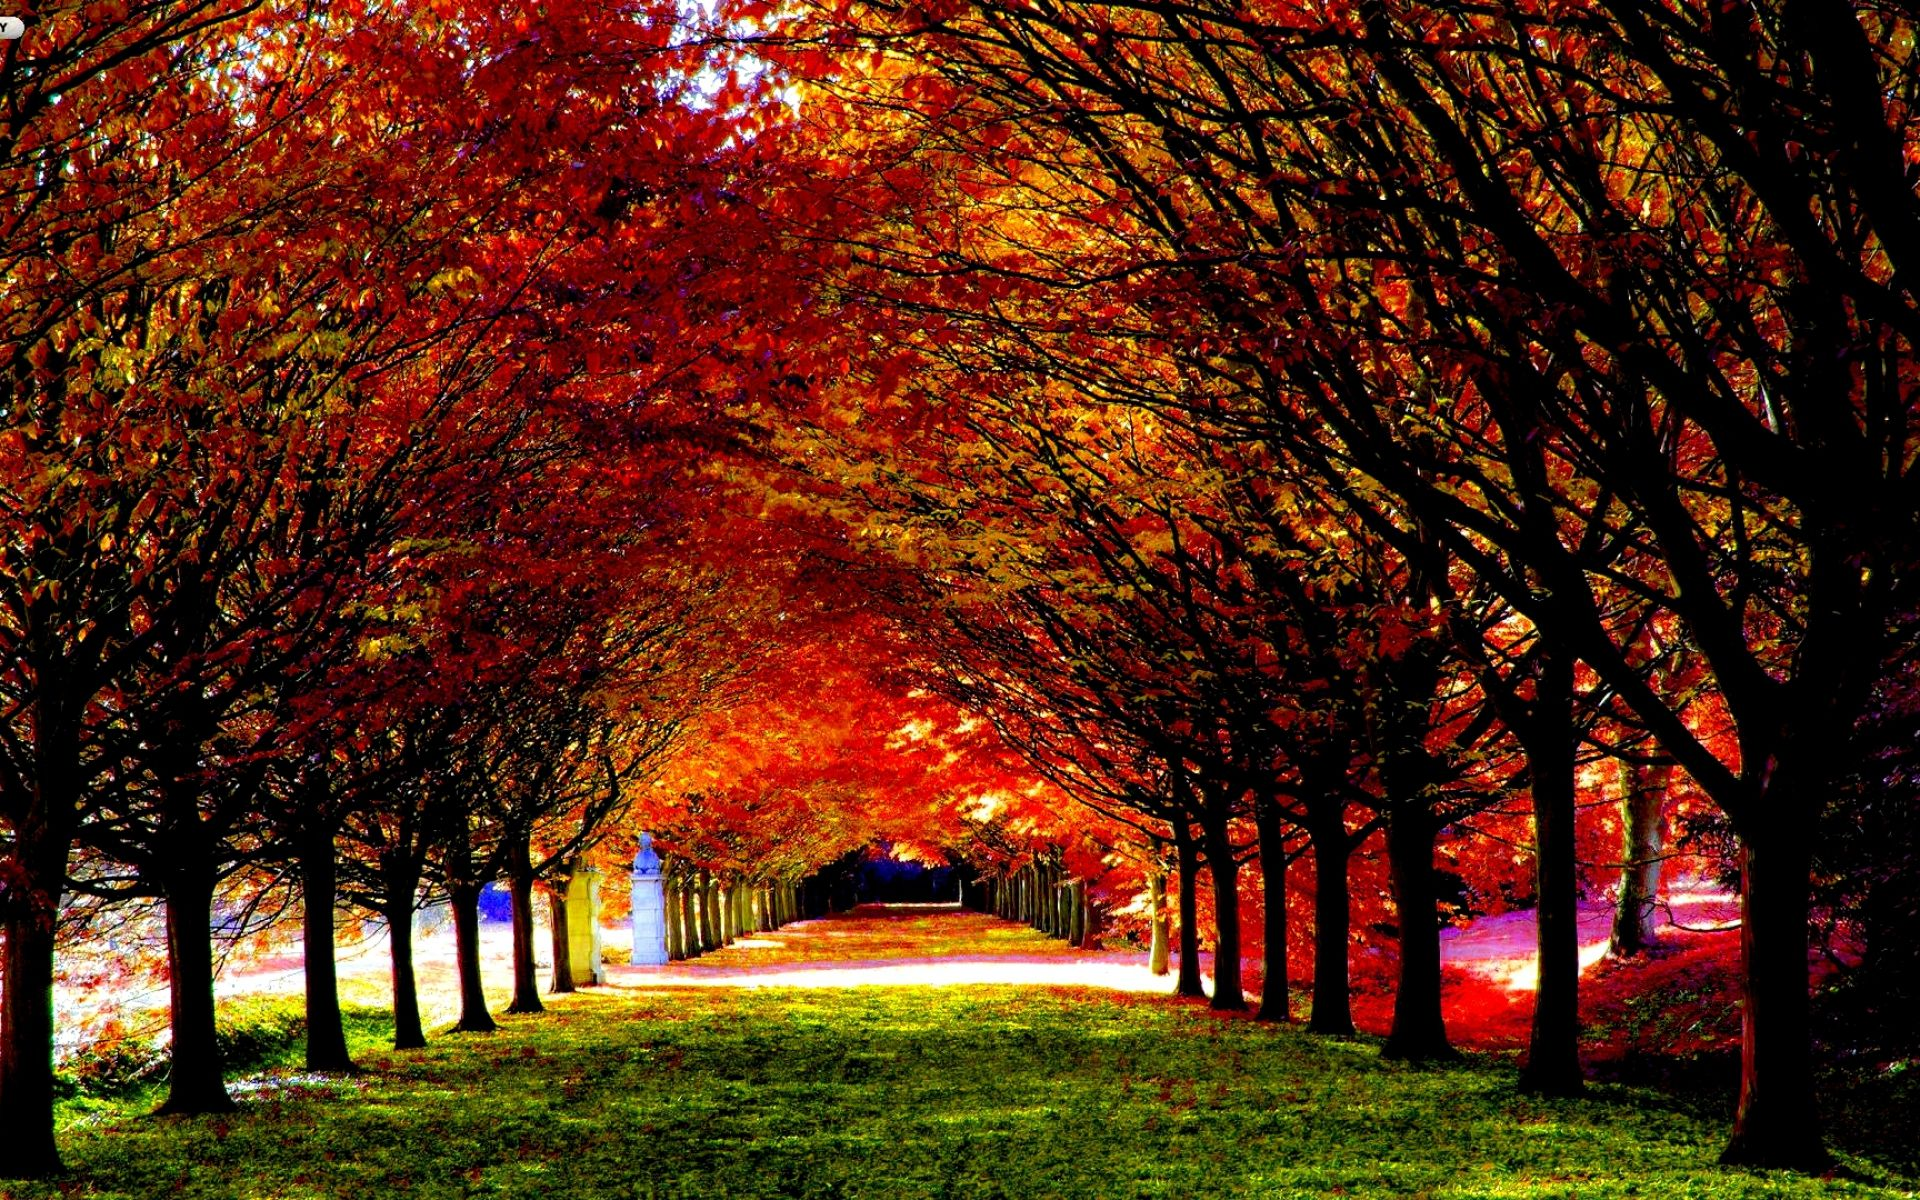 Beautiful Nature Fall Hd Hd Desktop 9 Hd Wallpapers Lzamgs